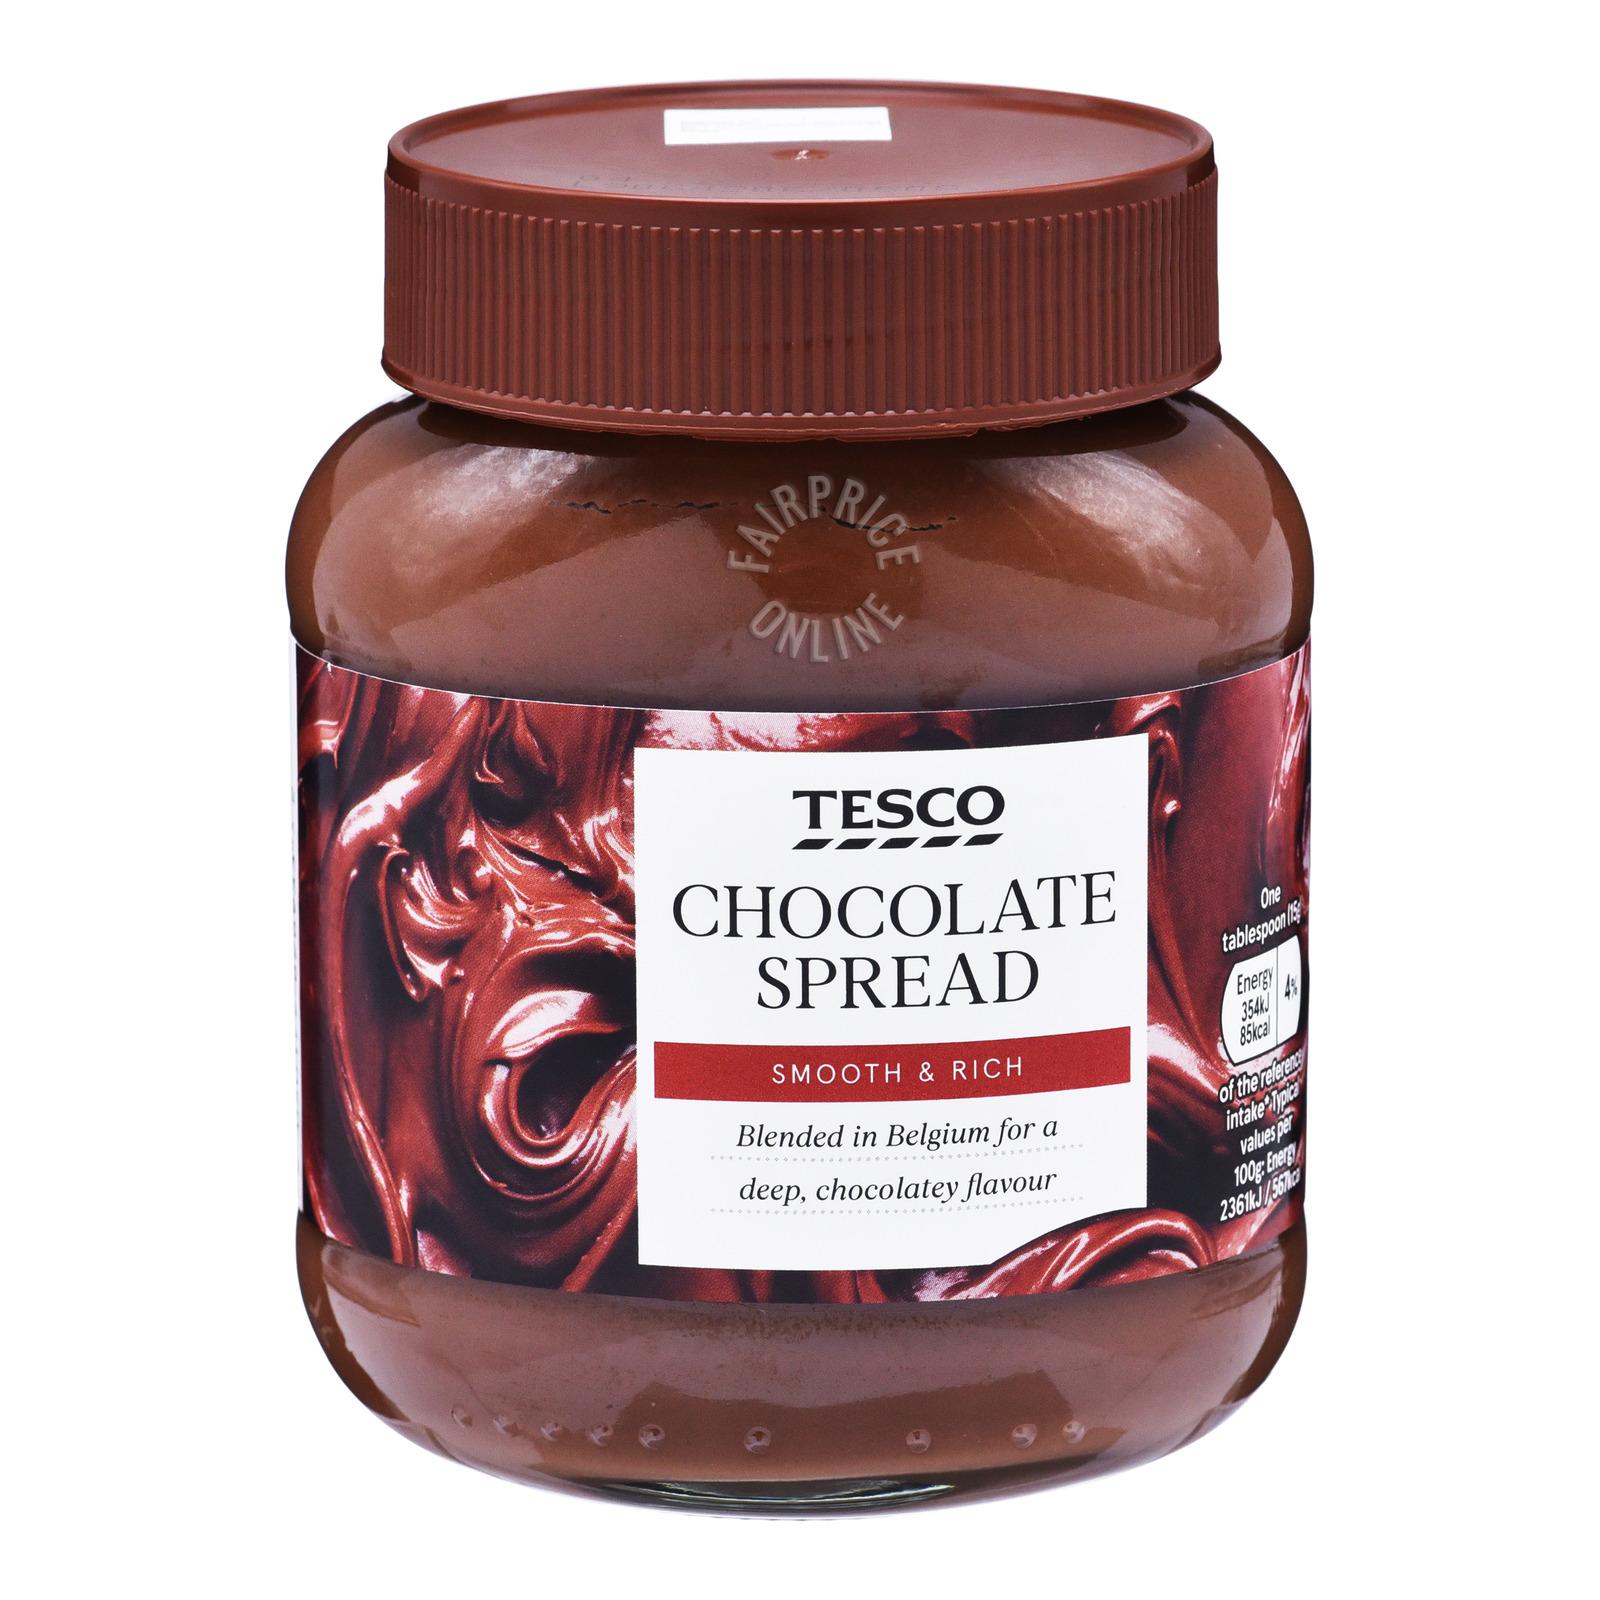 Tesco Chocolate Spread